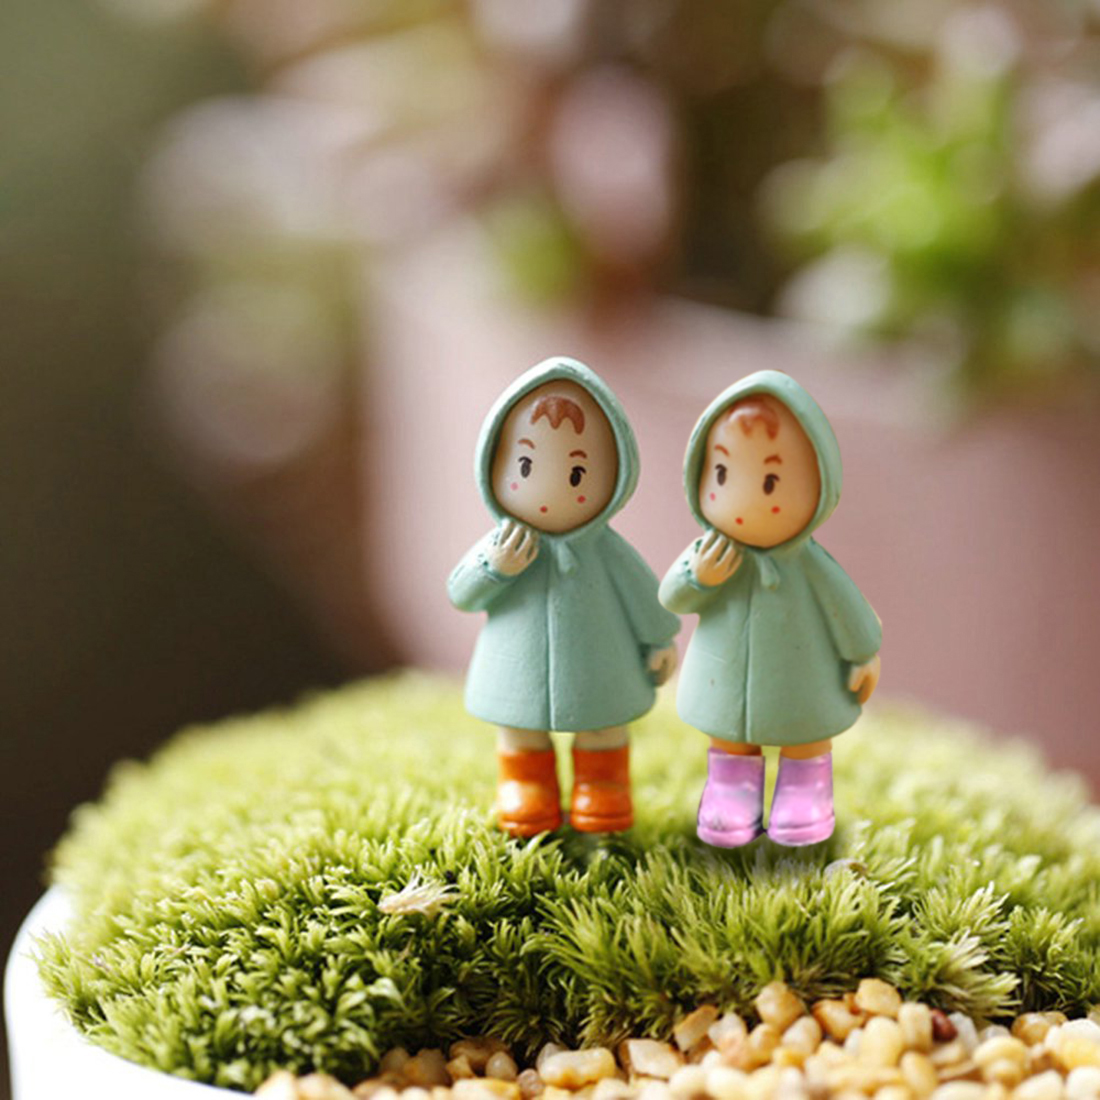 Winsome Mini Figurines Miniature Girl Mei Resin Crafts Ornament Fairygarden Gnomes Moss Terrariums Home Hot Sale Mini Figurines Miniature Girl Mei Resin Crafts garden Micro Mini Fairy Garden